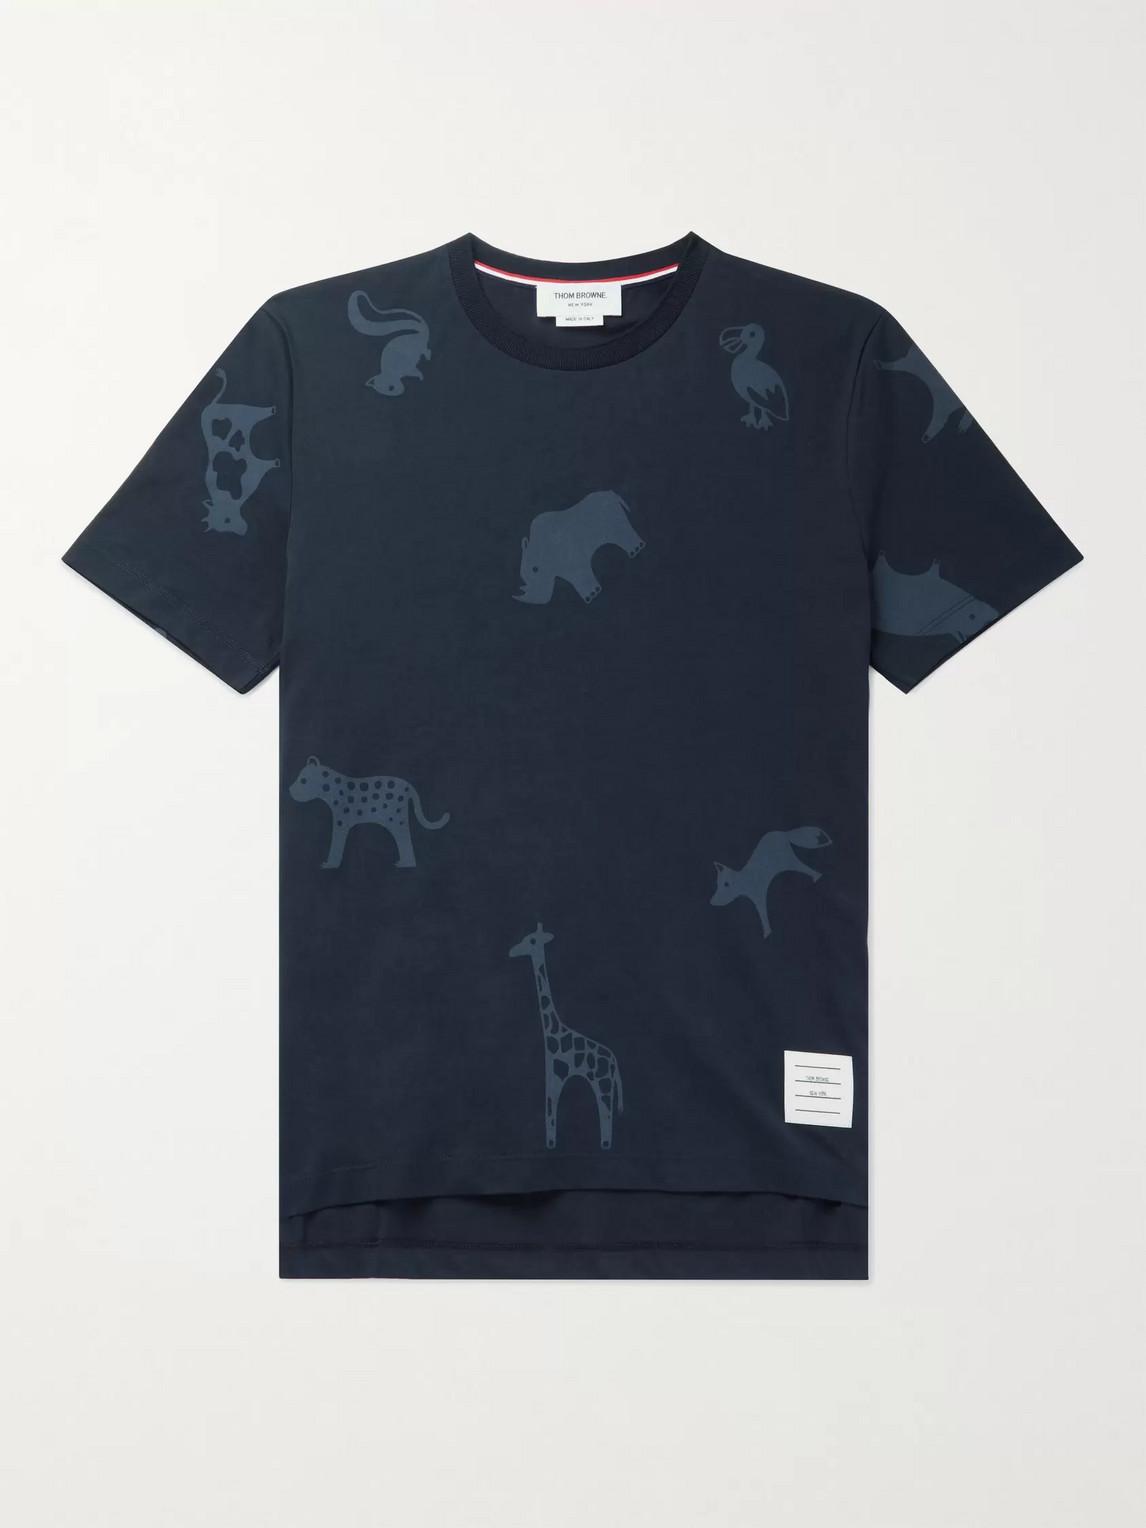 thom browne - printed cotton-jersey t-shirt - men - blue